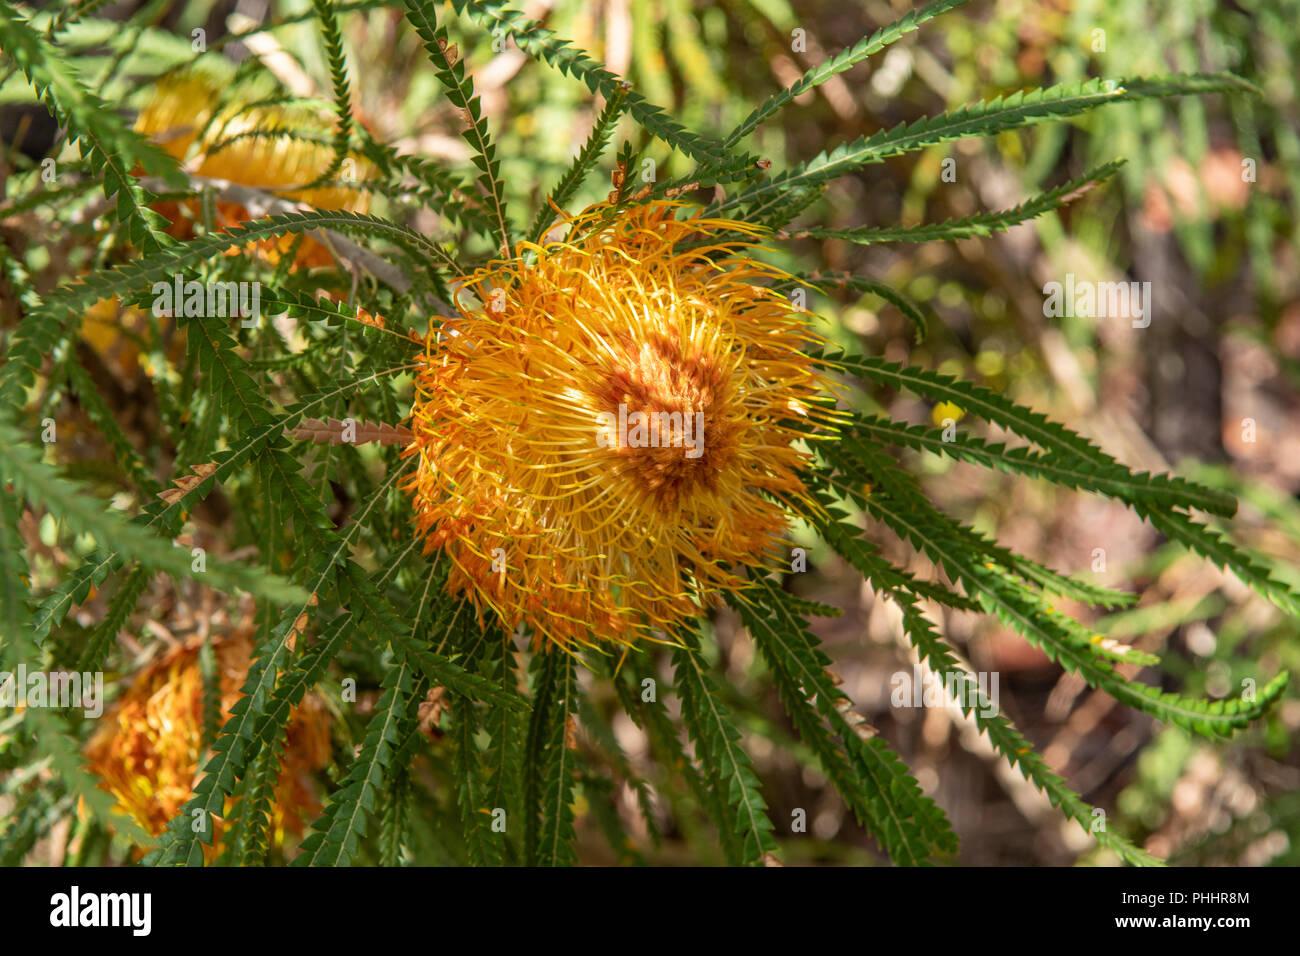 Dryandra formosa, Showy Dryandra - Stock Image